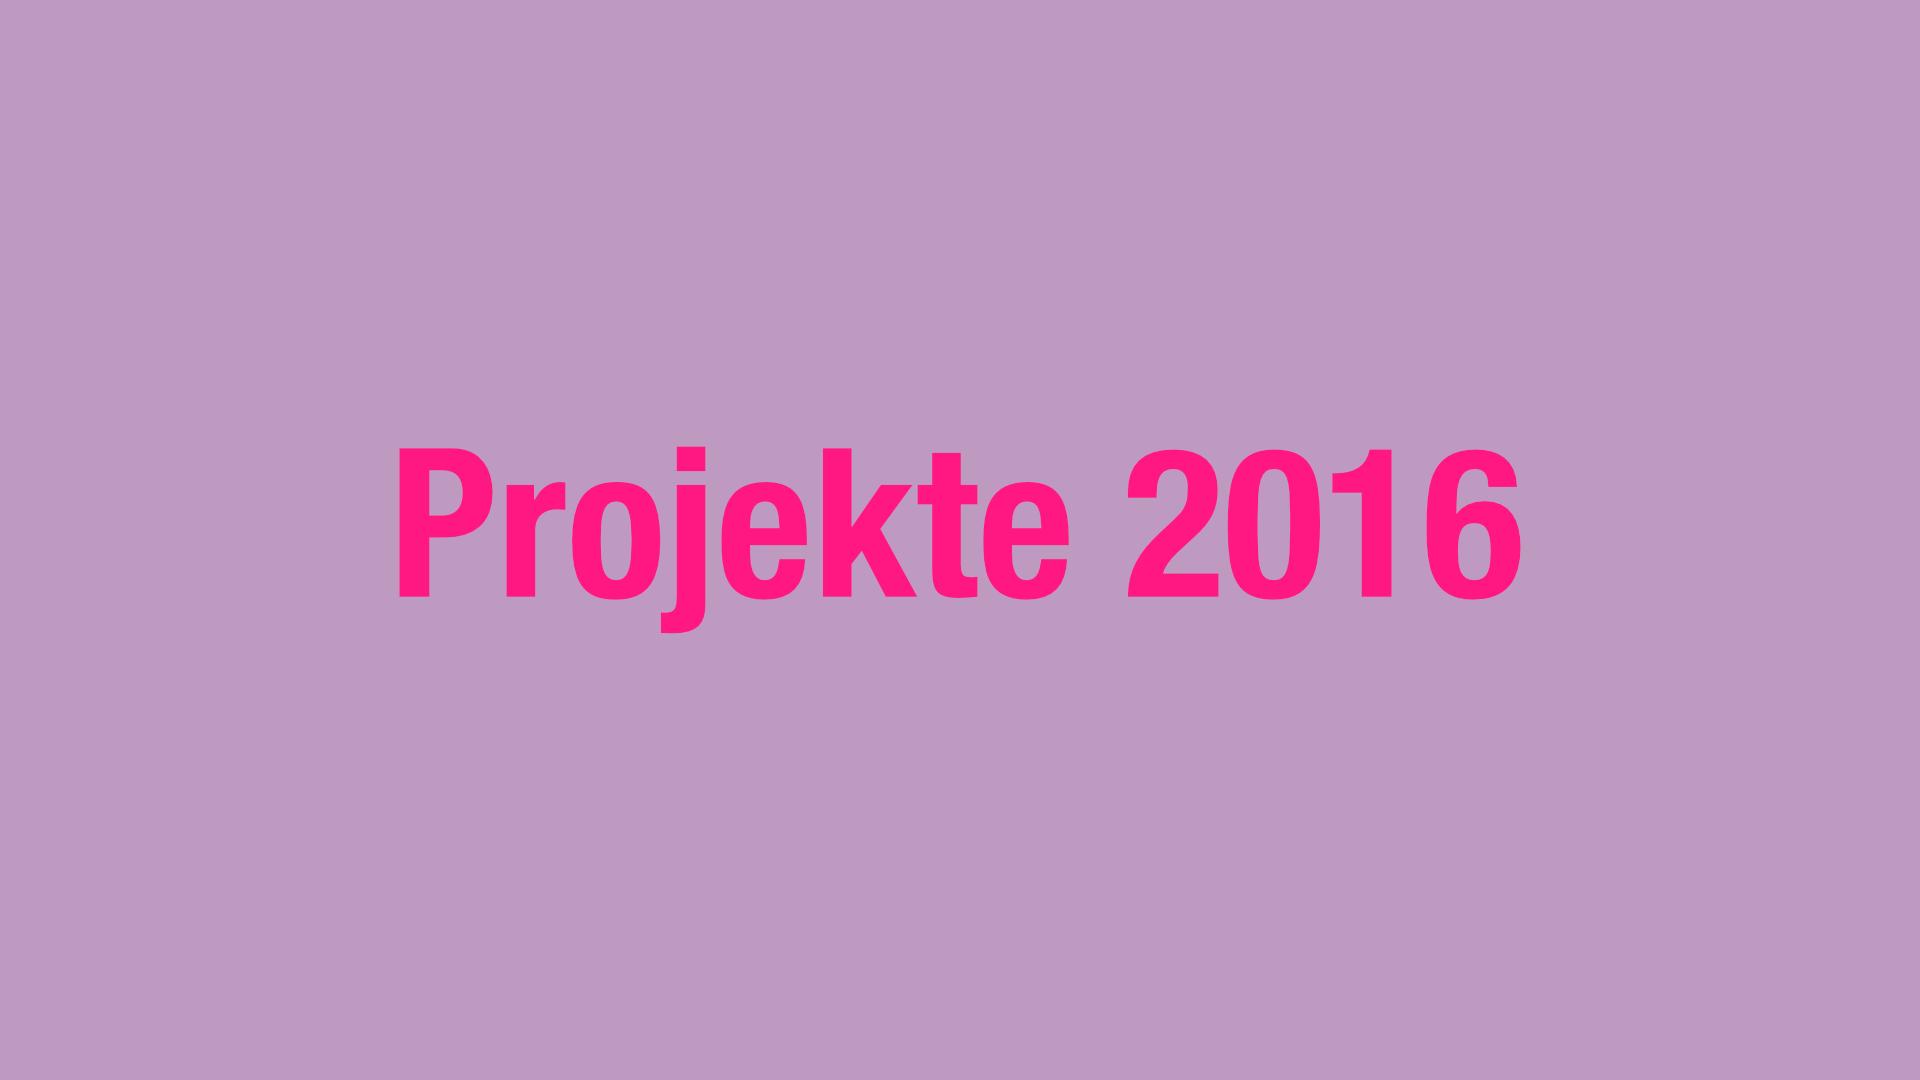 Projekte 2016